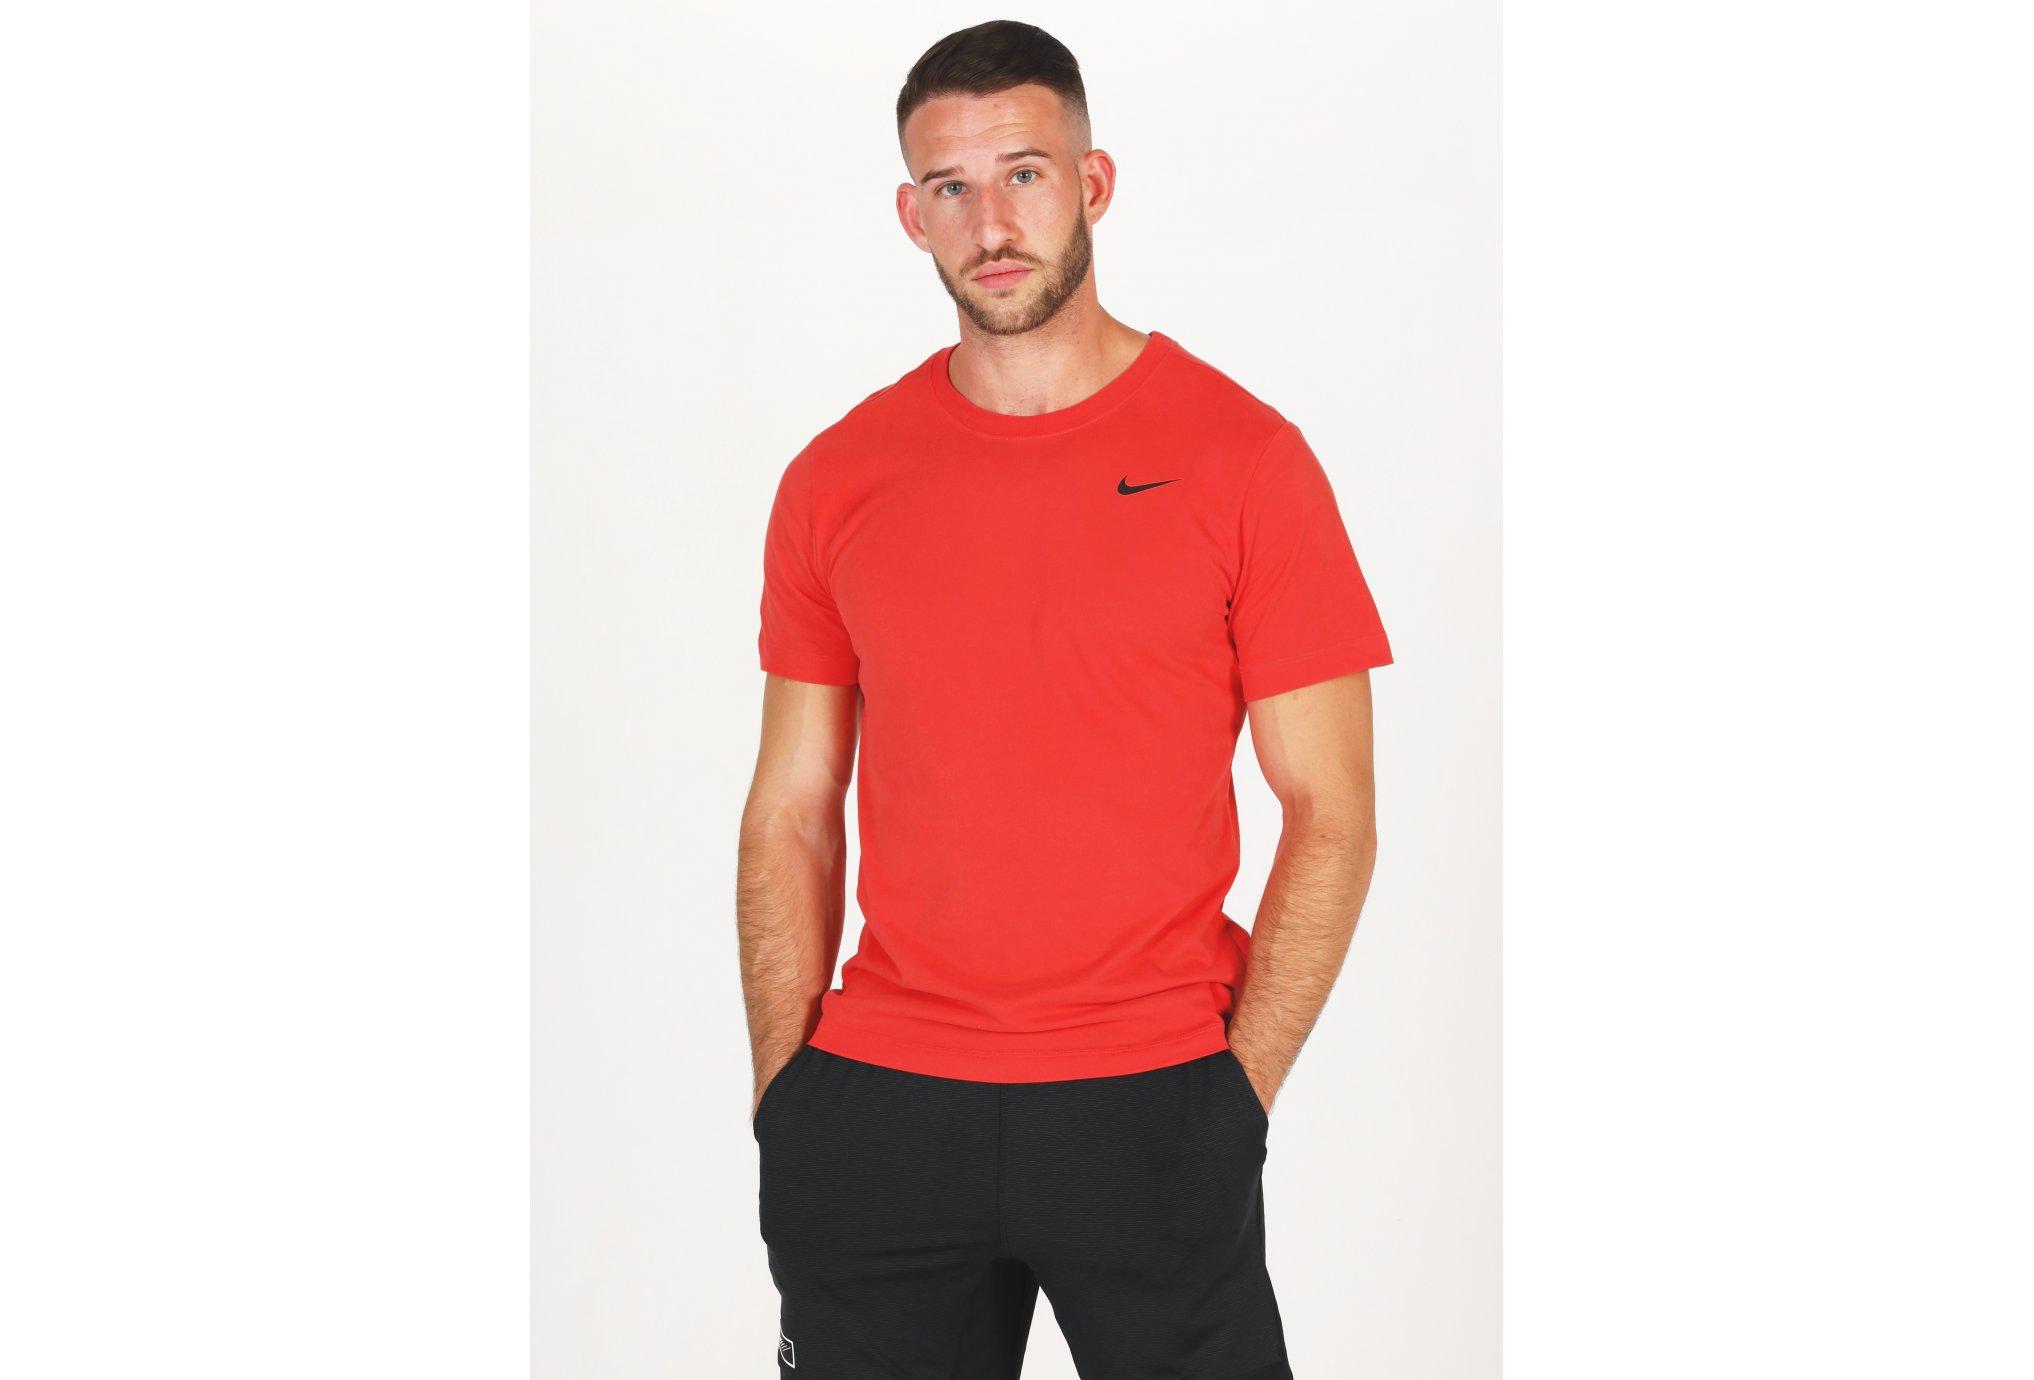 Nike Dfc Solid Crew M vêtement running homme